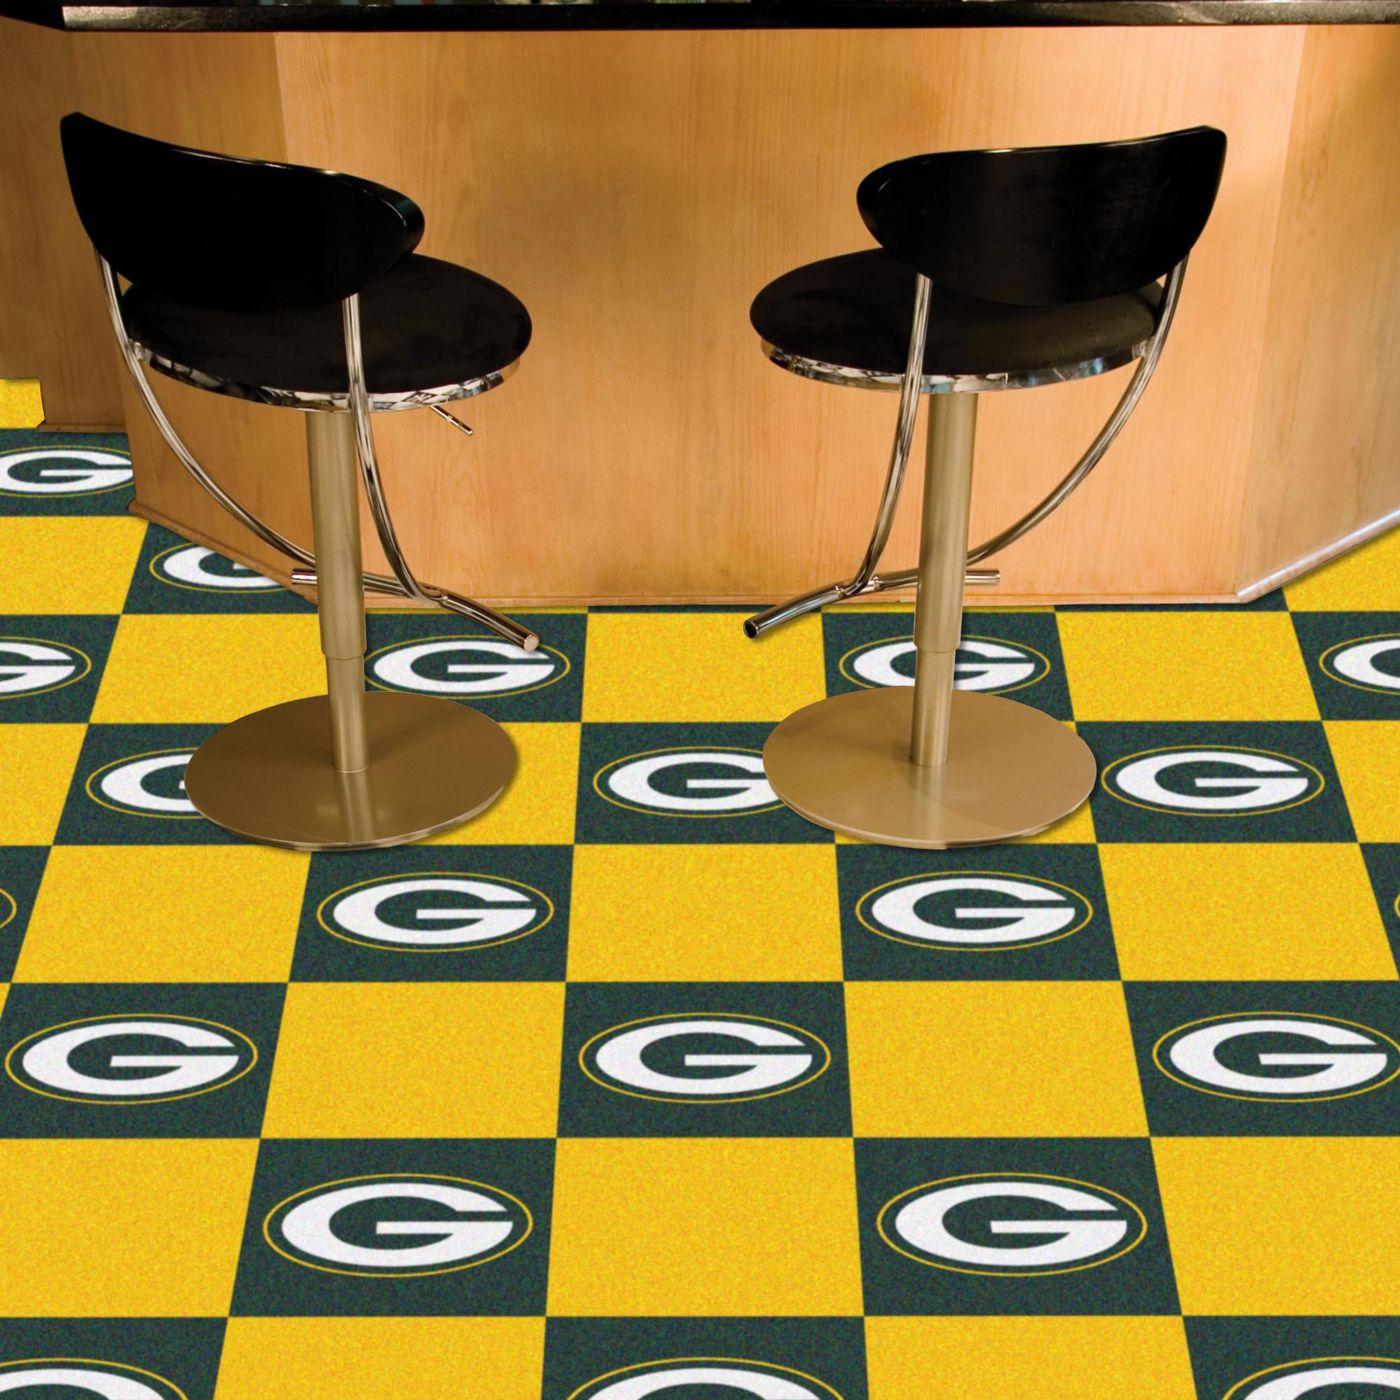 FANMATS Green Bay Packers Team Carpet Tiles